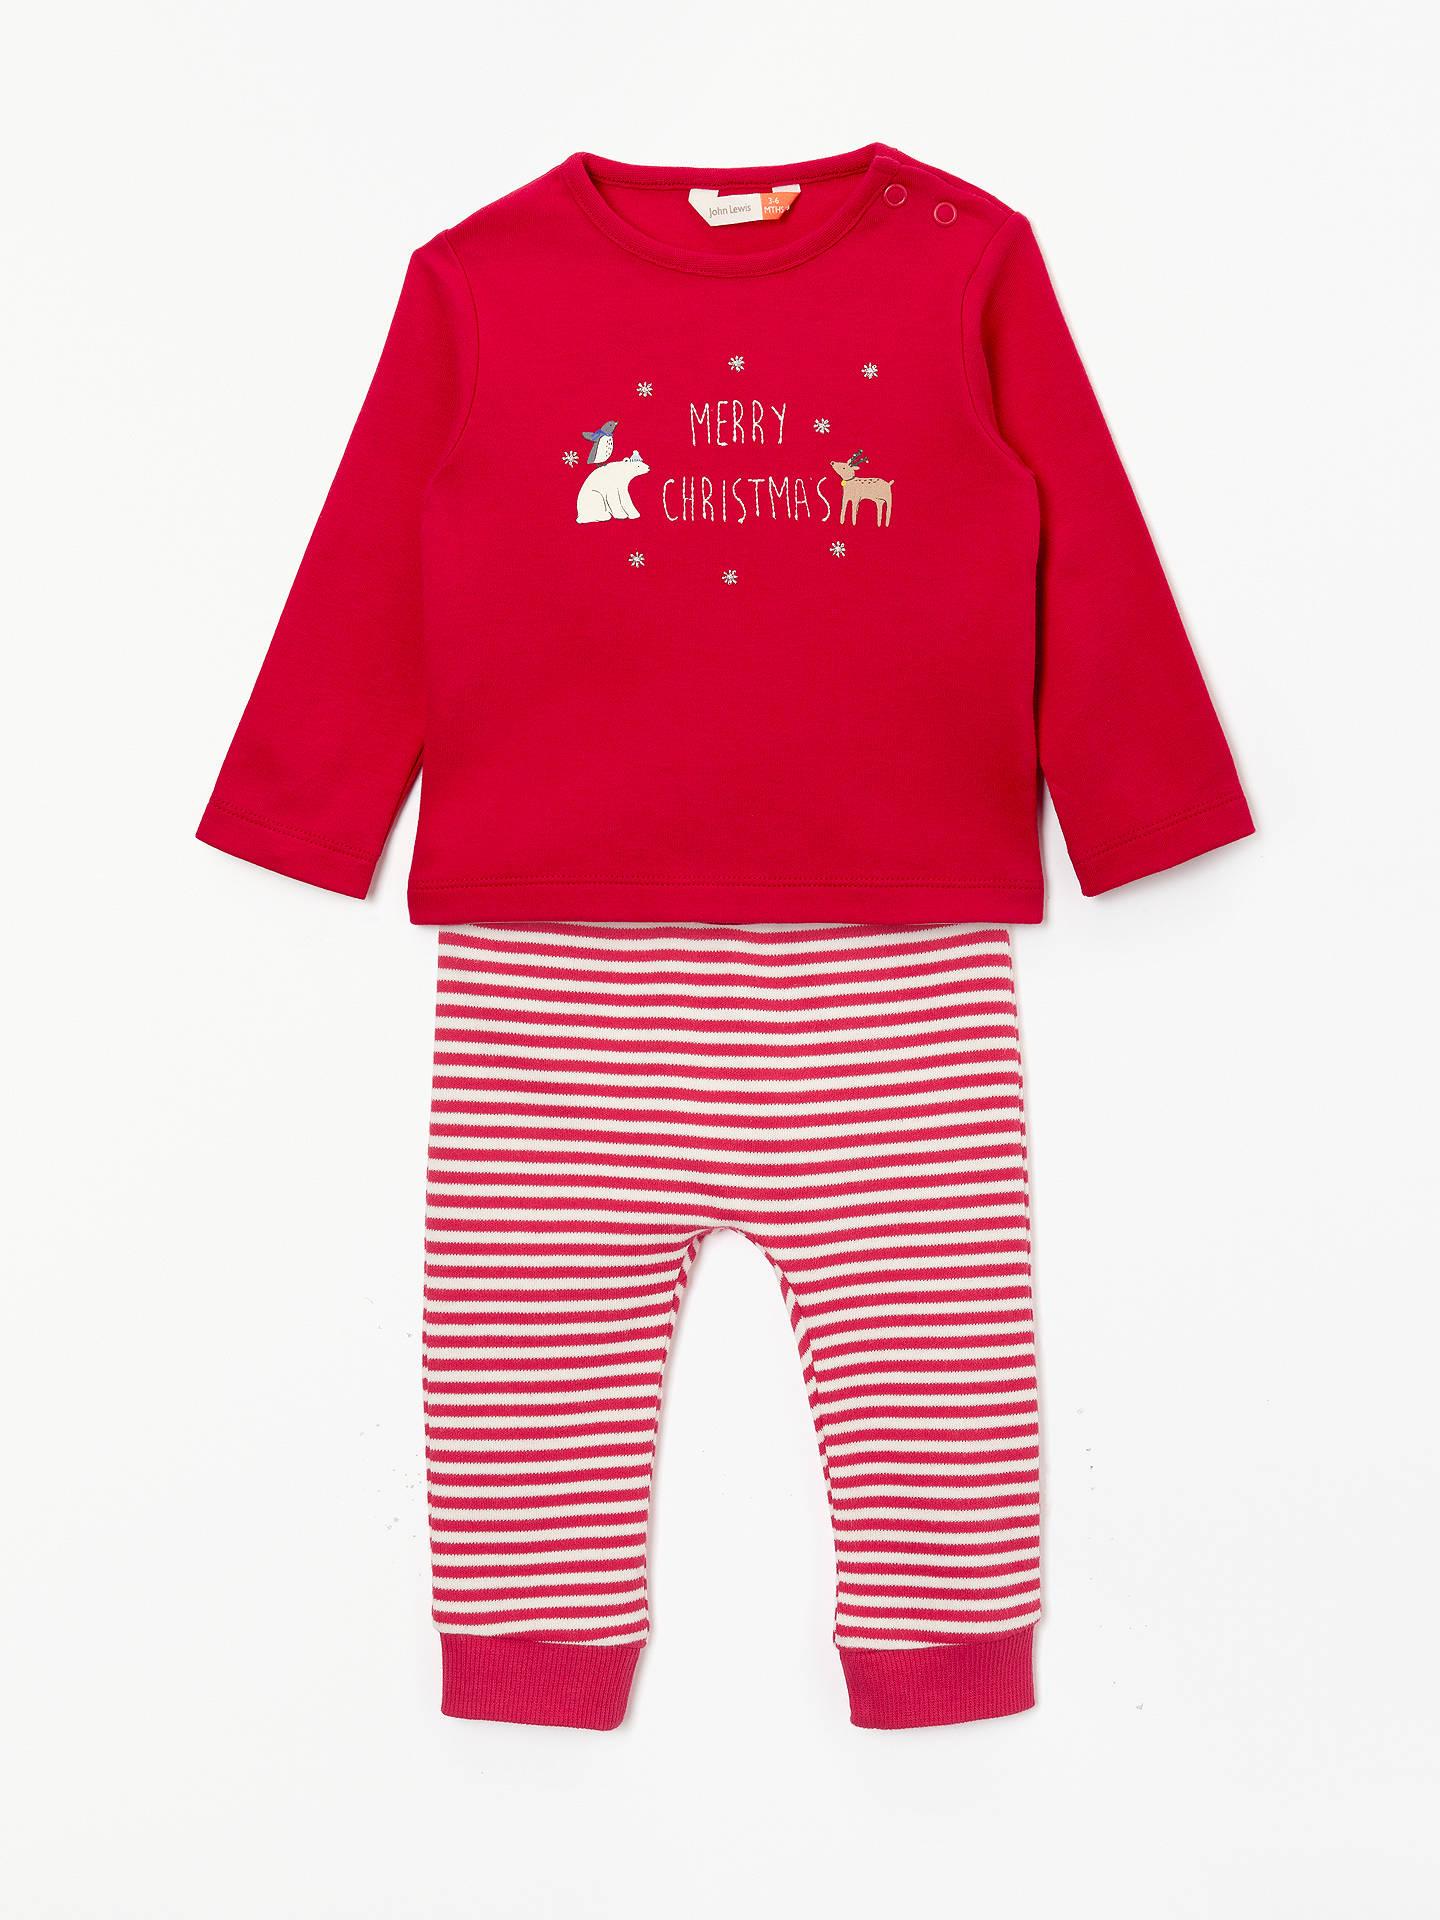 ad58a6acbe9b39 Buy John Lewis & Partners Baby Christmas Long Sleeve T-Shirt and Legging Set,  ...